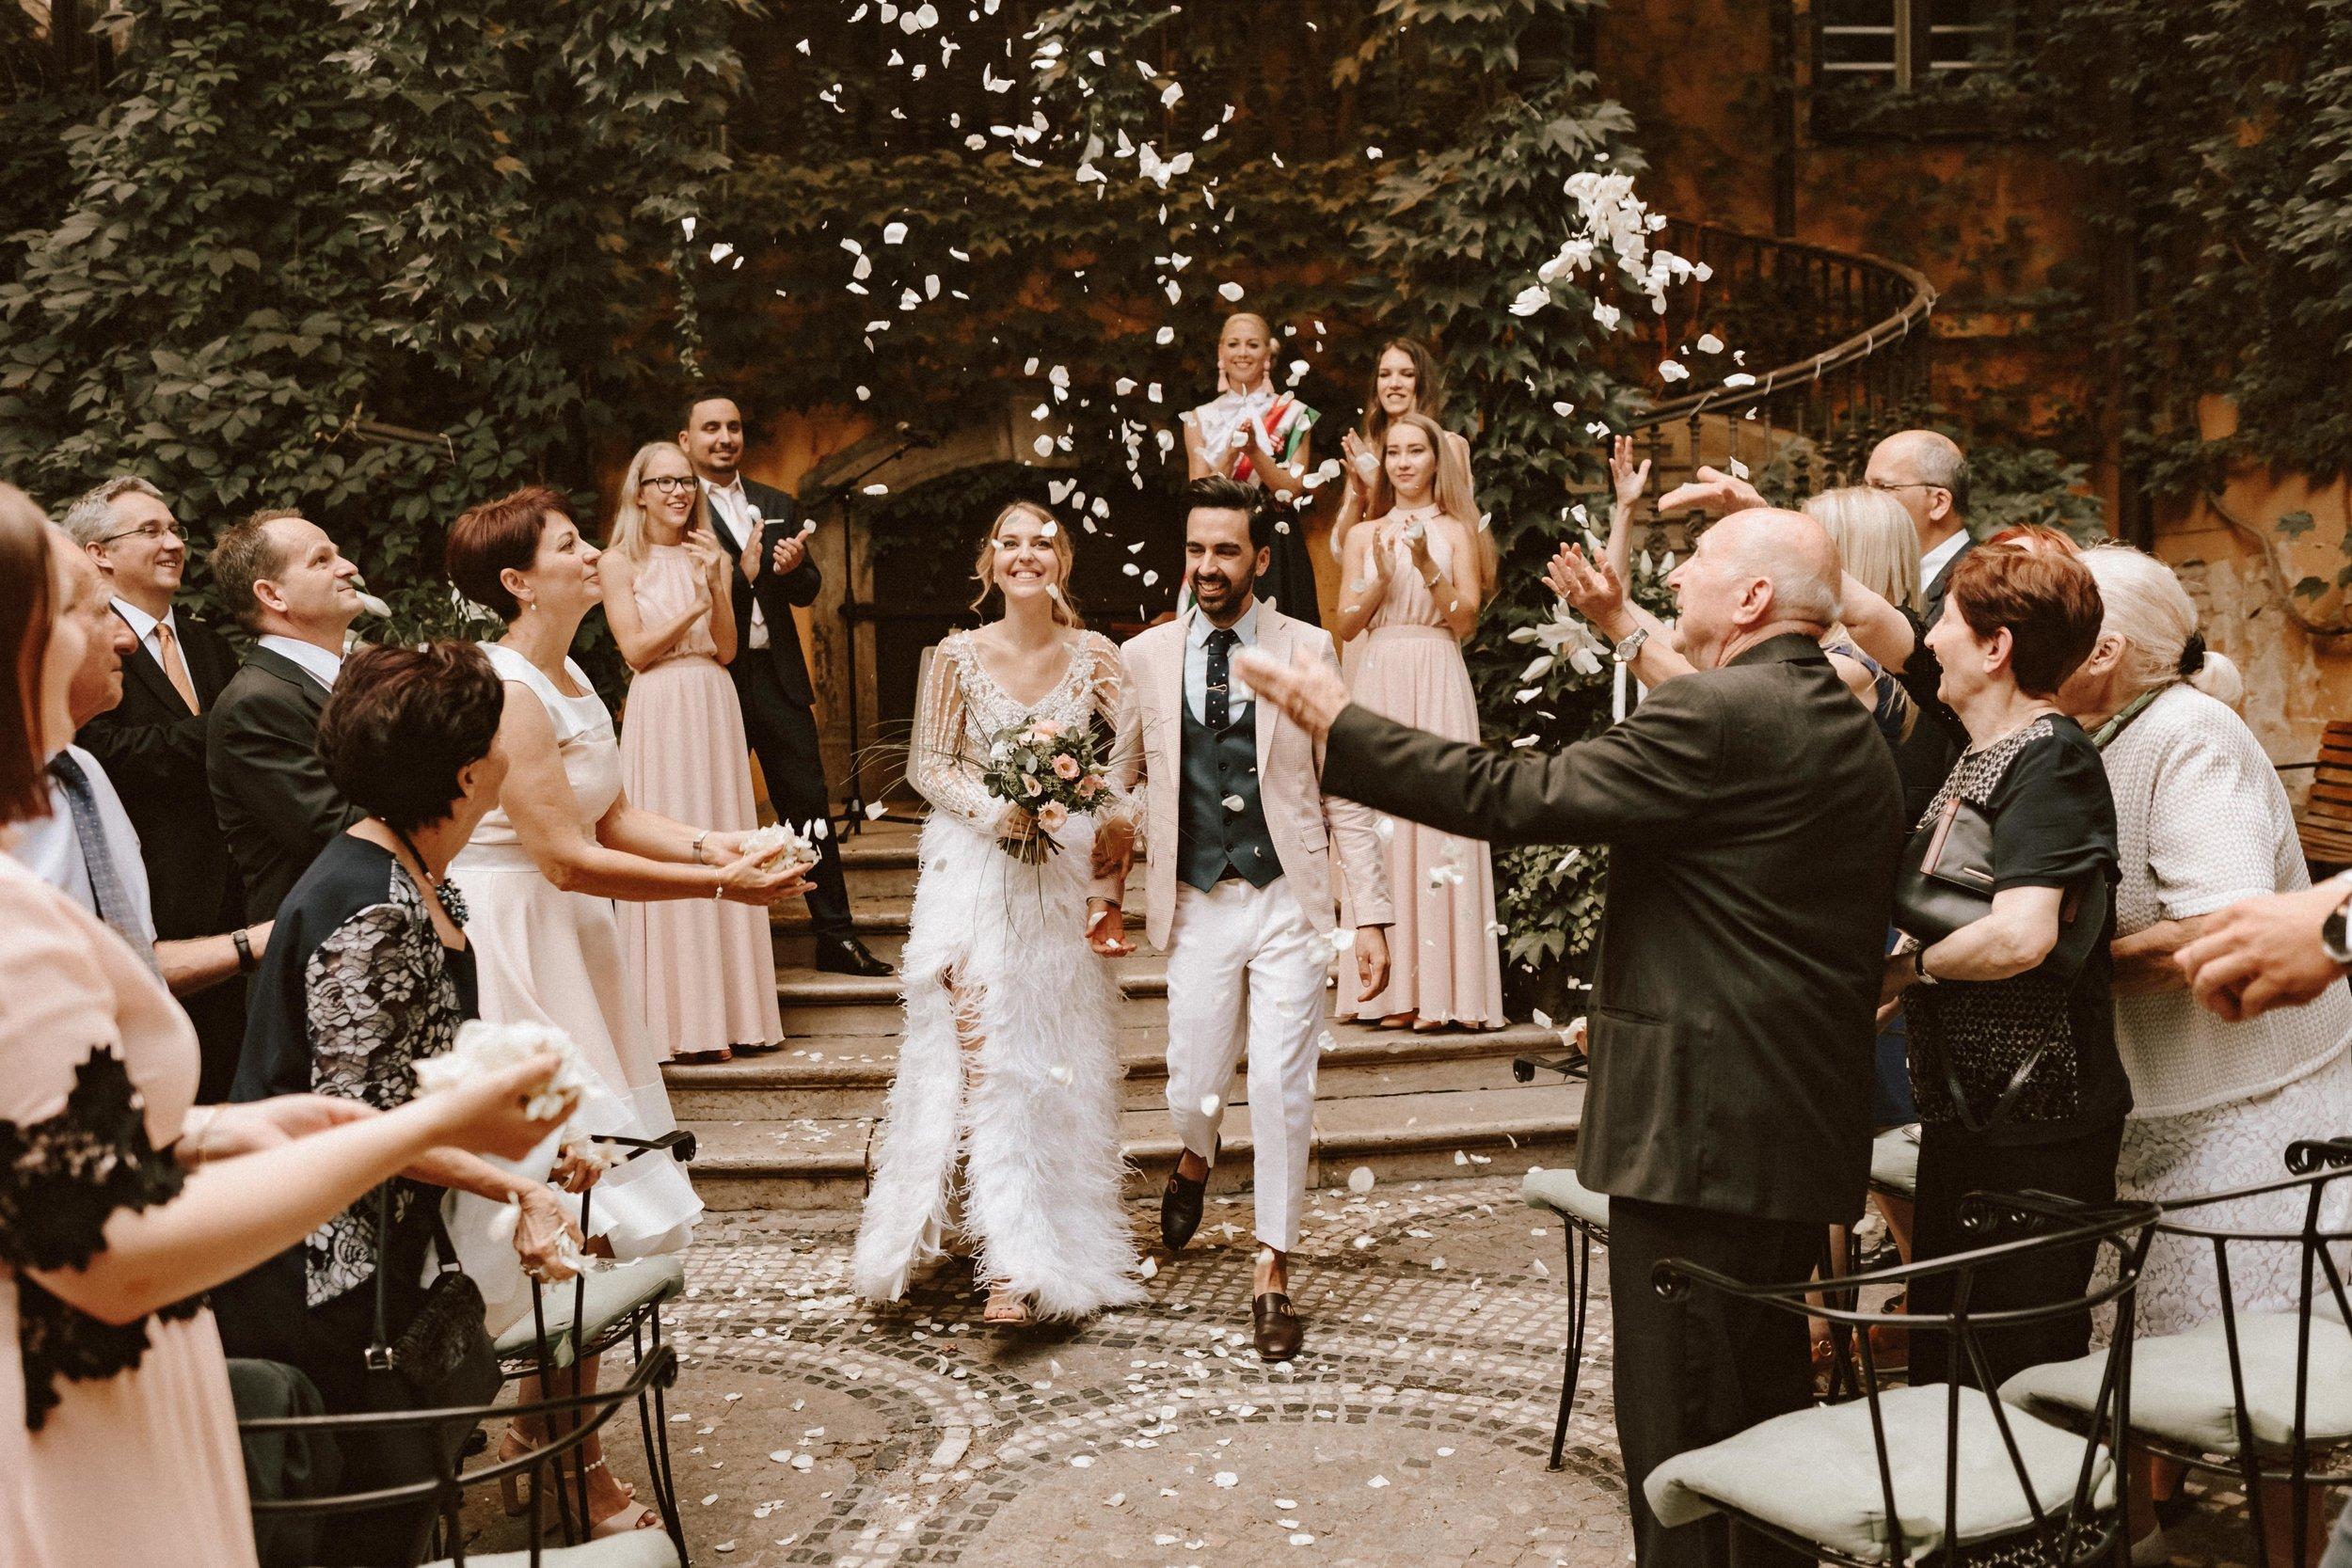 1819-Evelin+Peti-wedding-311-w.jpg